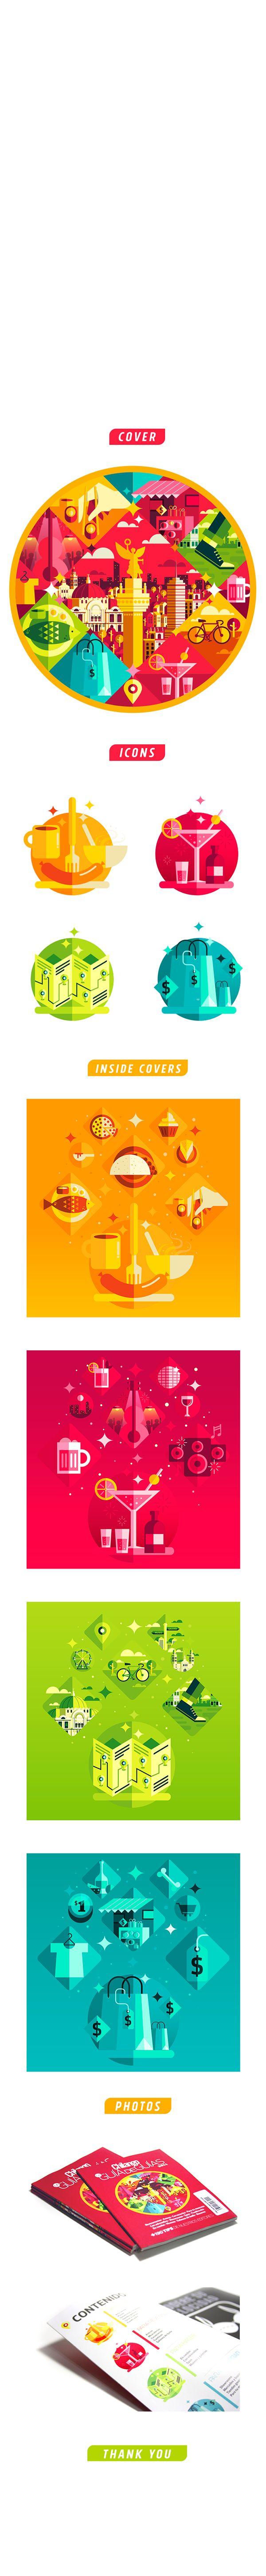 Chilango - Guia de Guias 2014 on Illustration Served